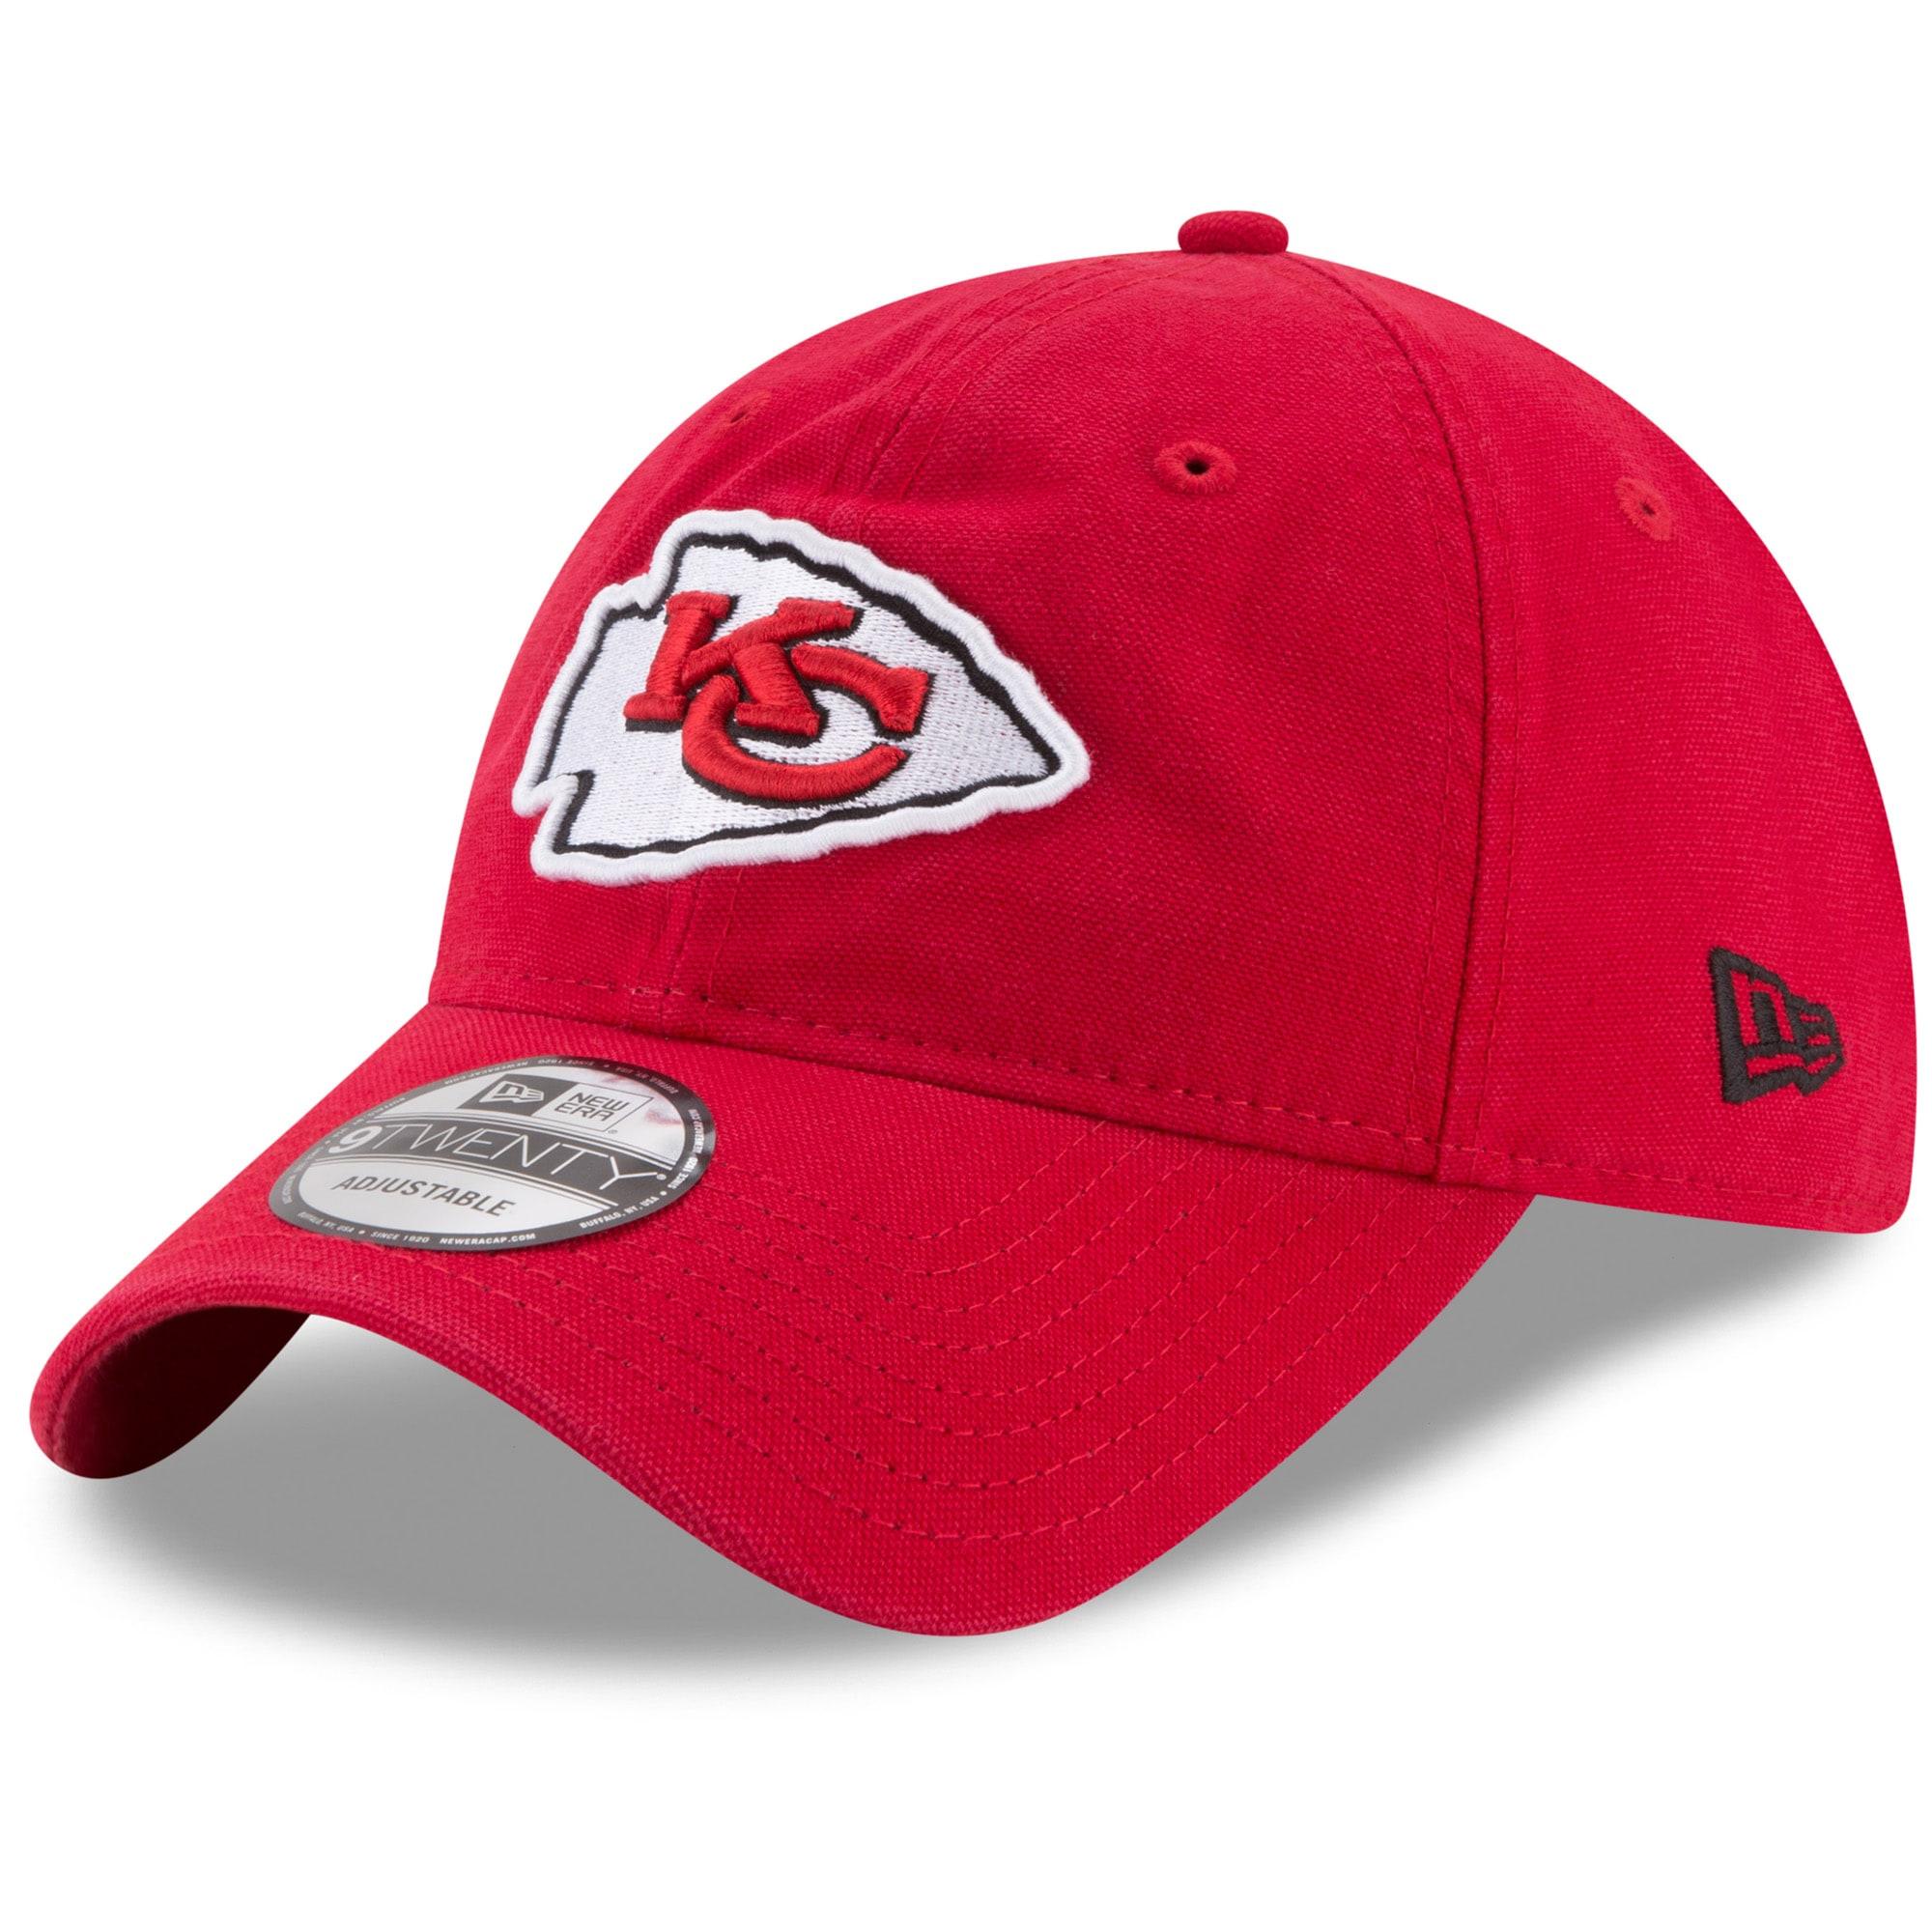 Kansas City Chiefs New Era Core Classic 9TWENTY Adjustable Hat - Red